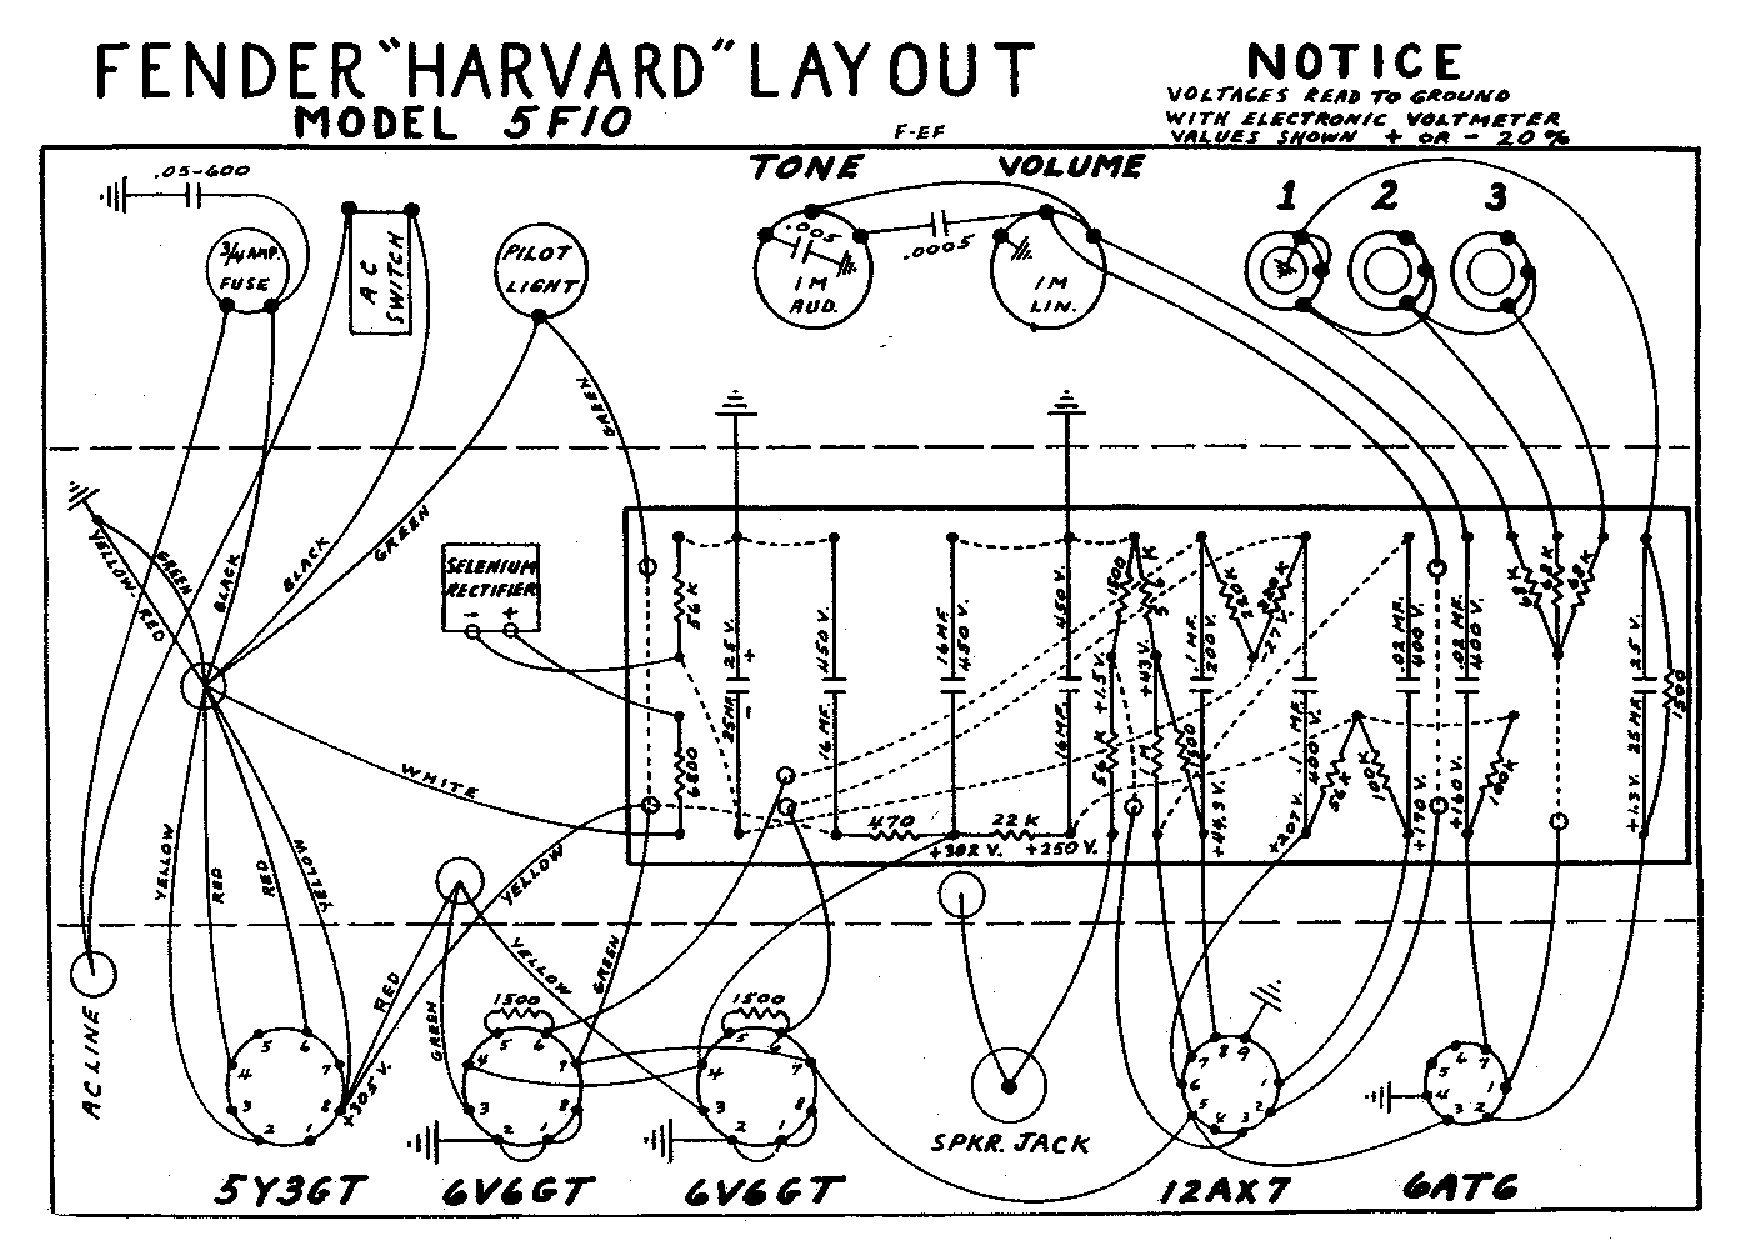 fender harvard 5f10 layout service manual download schematics eeprom repair info for. Black Bedroom Furniture Sets. Home Design Ideas